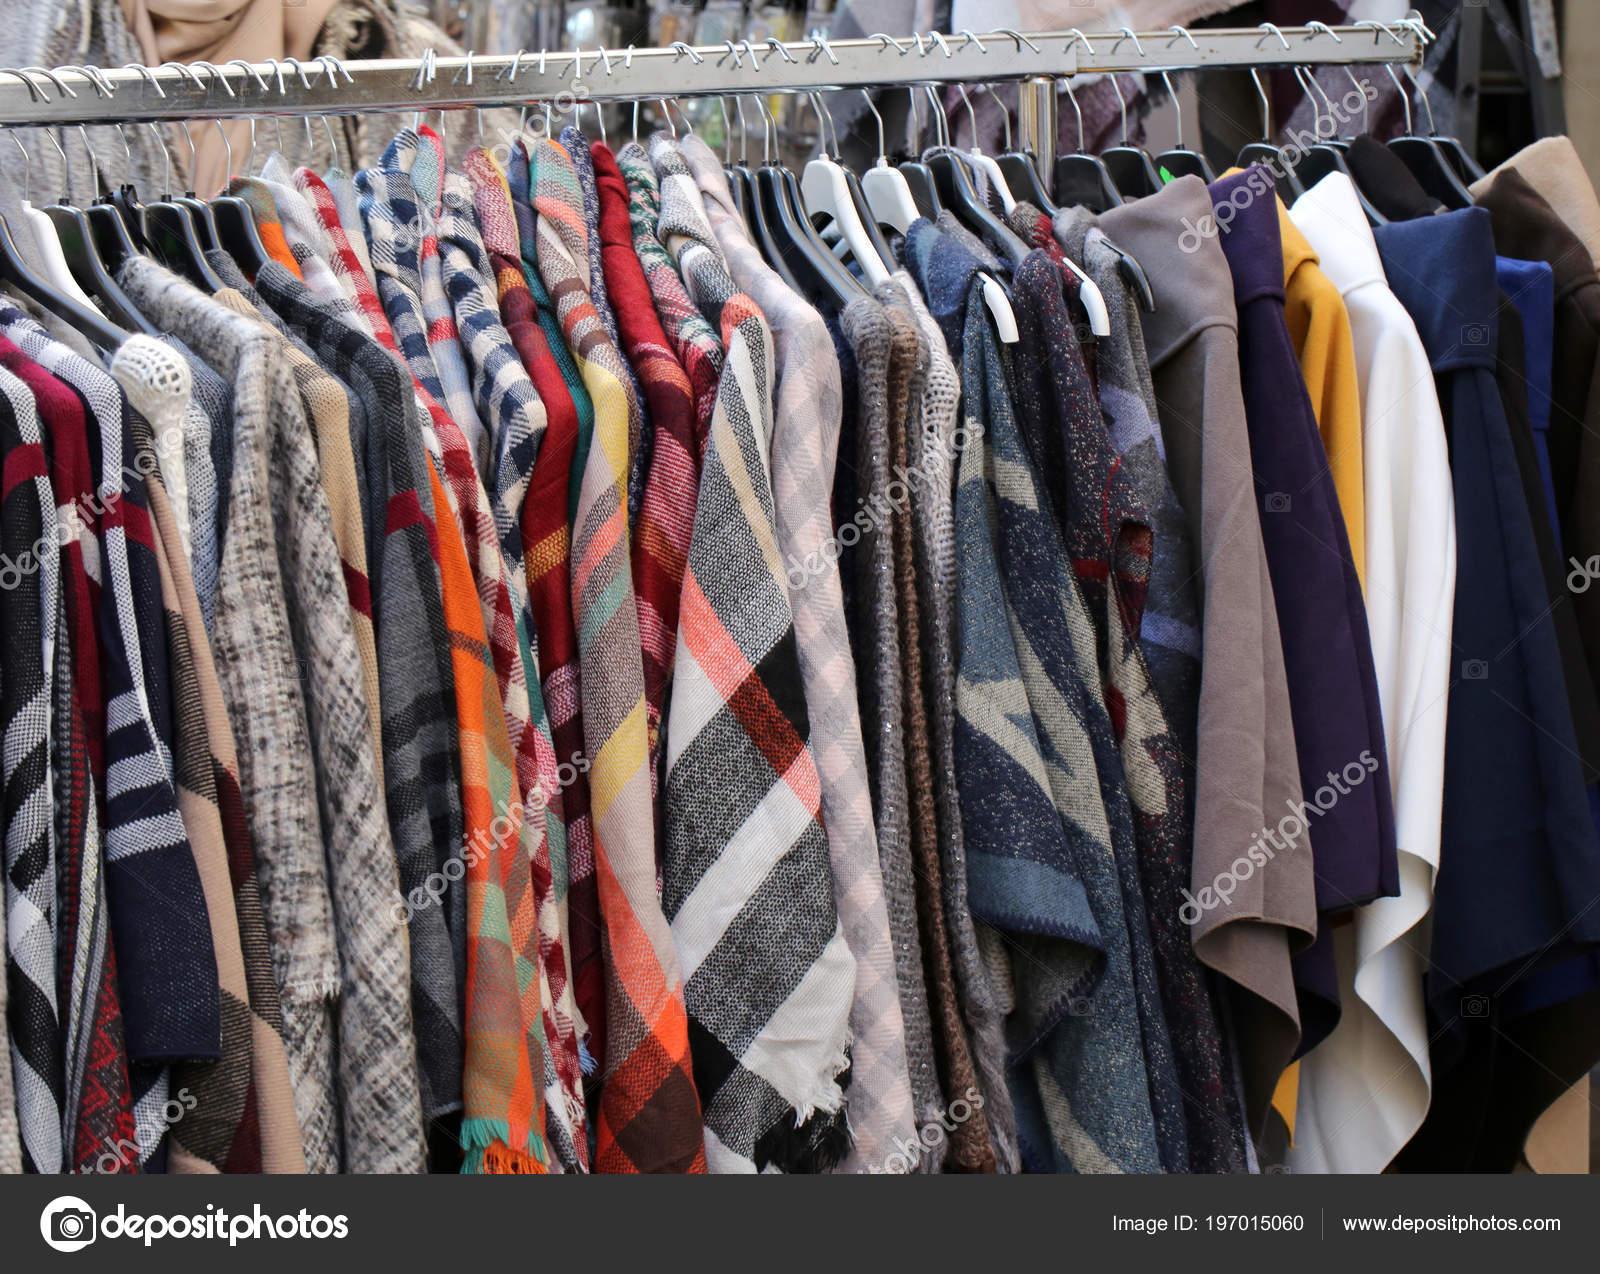 Gebruikte Kleding.Jas Shirts Veel Gebruikte Kleren Opknoping Stal Van Vlooienmarkt